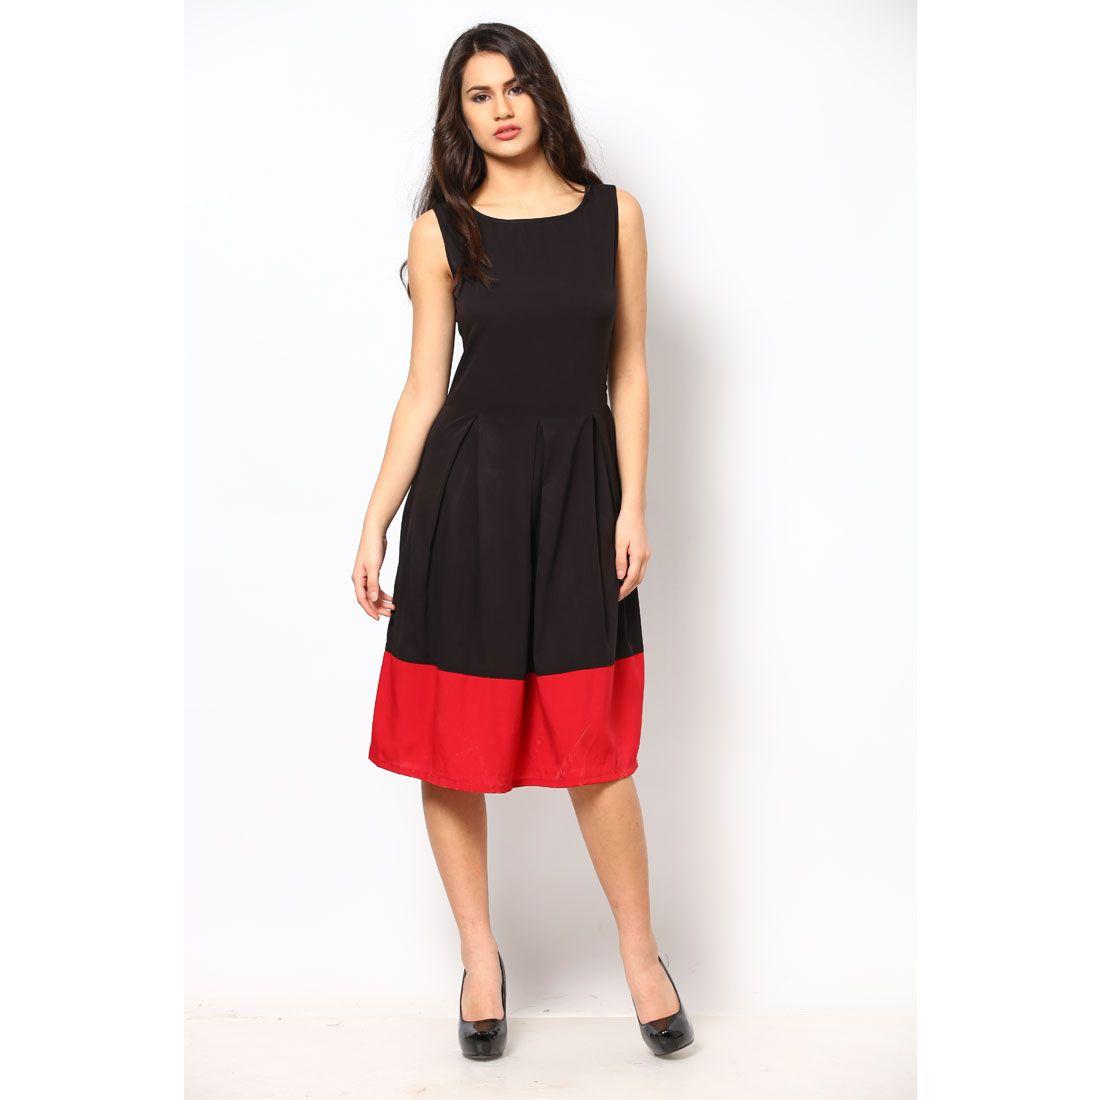 e85723cb7e0e5 Buy Eavan Black Red Dress @ Rs.1,699.00 # PartyDress ...